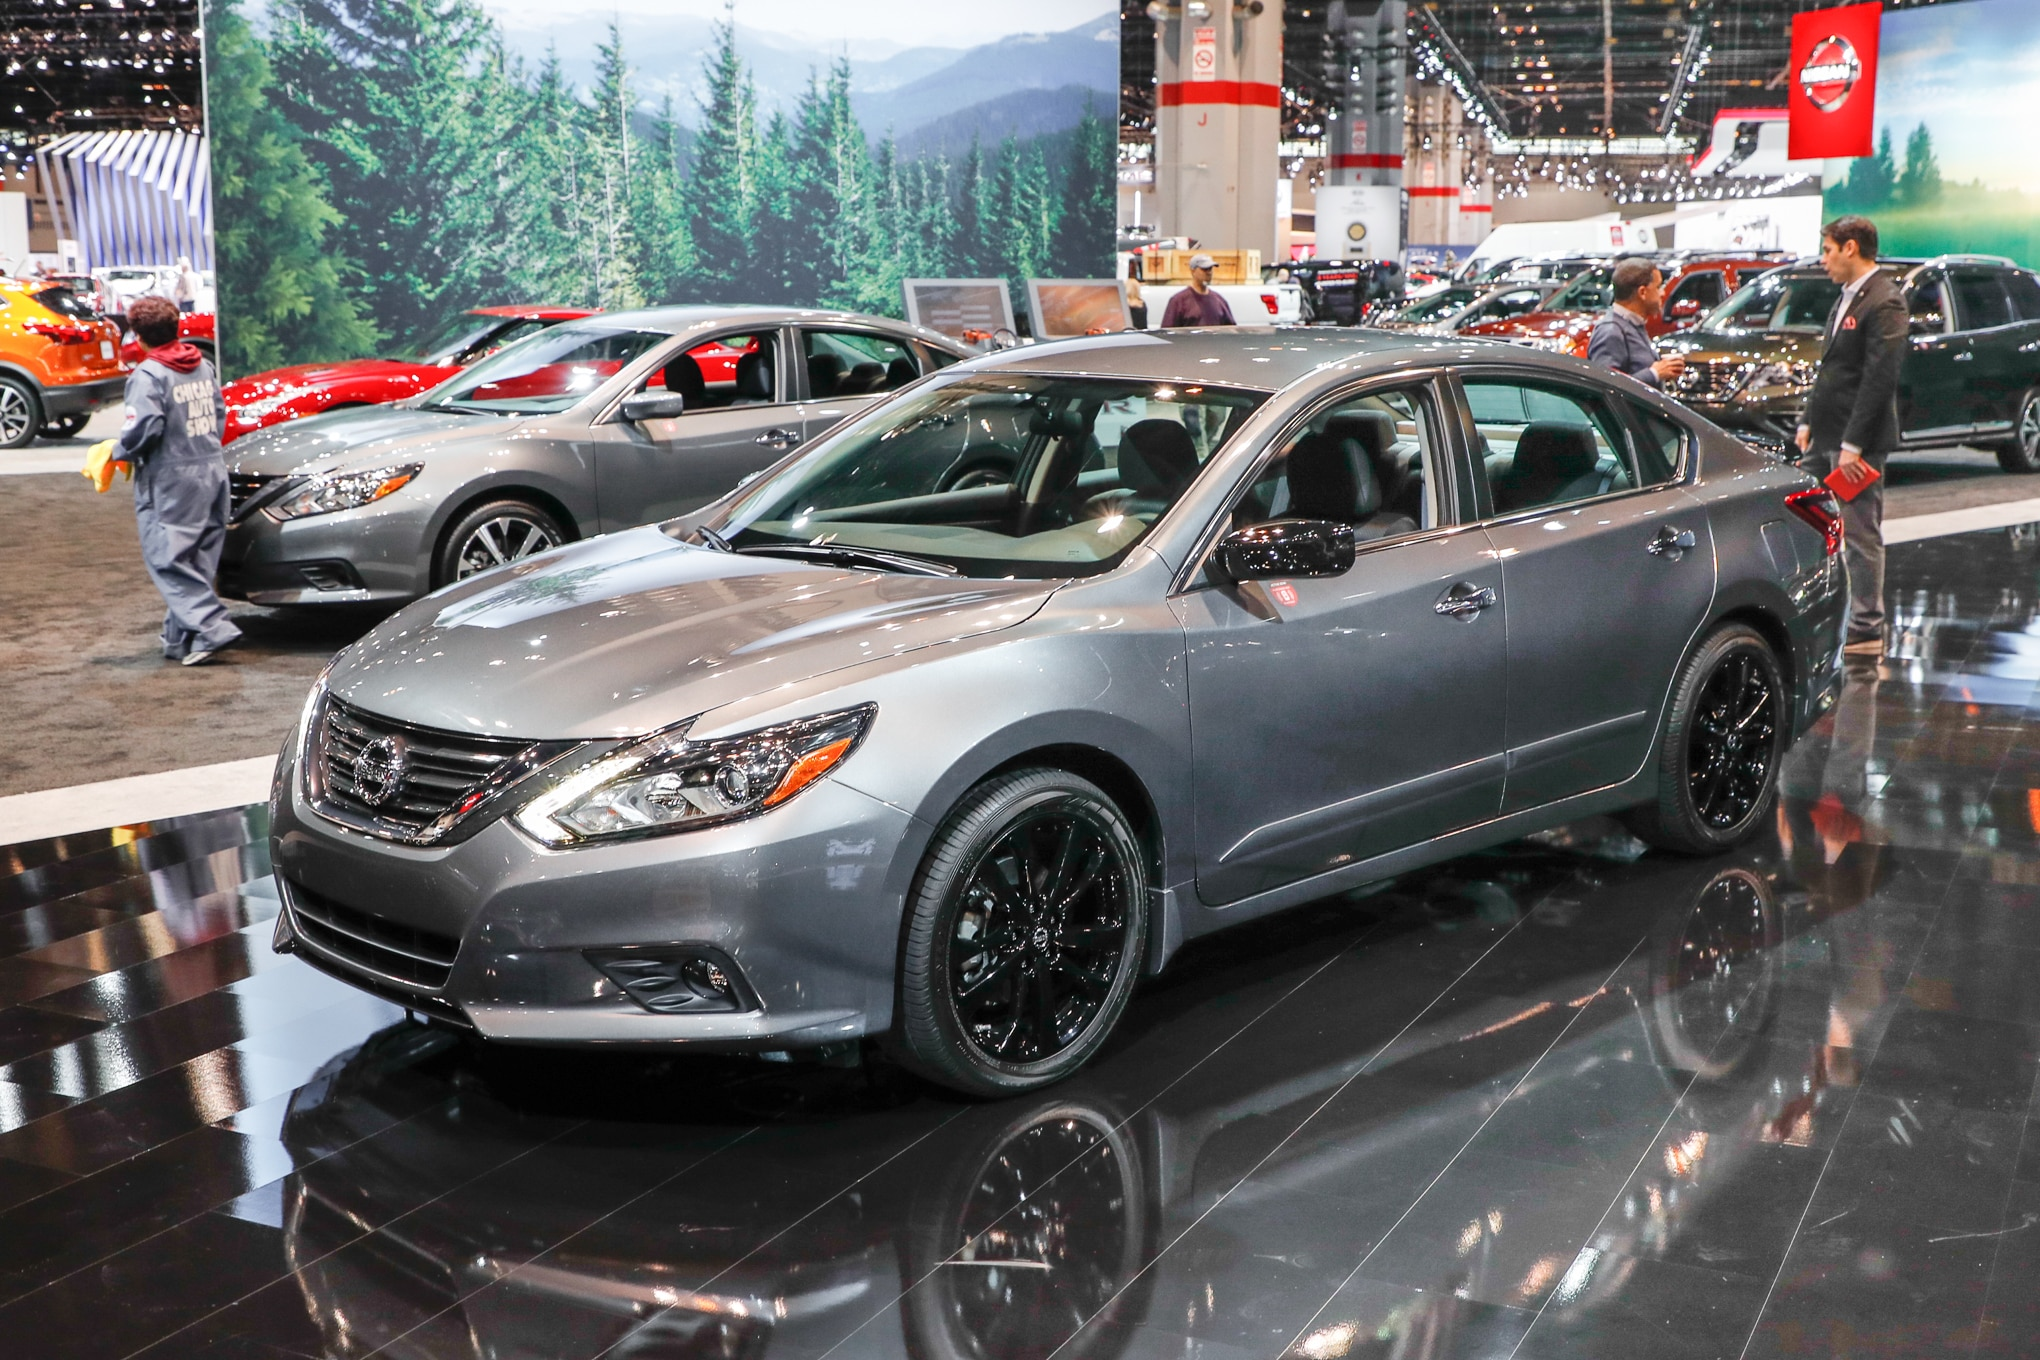 2017 Nissan Altima SR Midnight Edition front three quarter 2